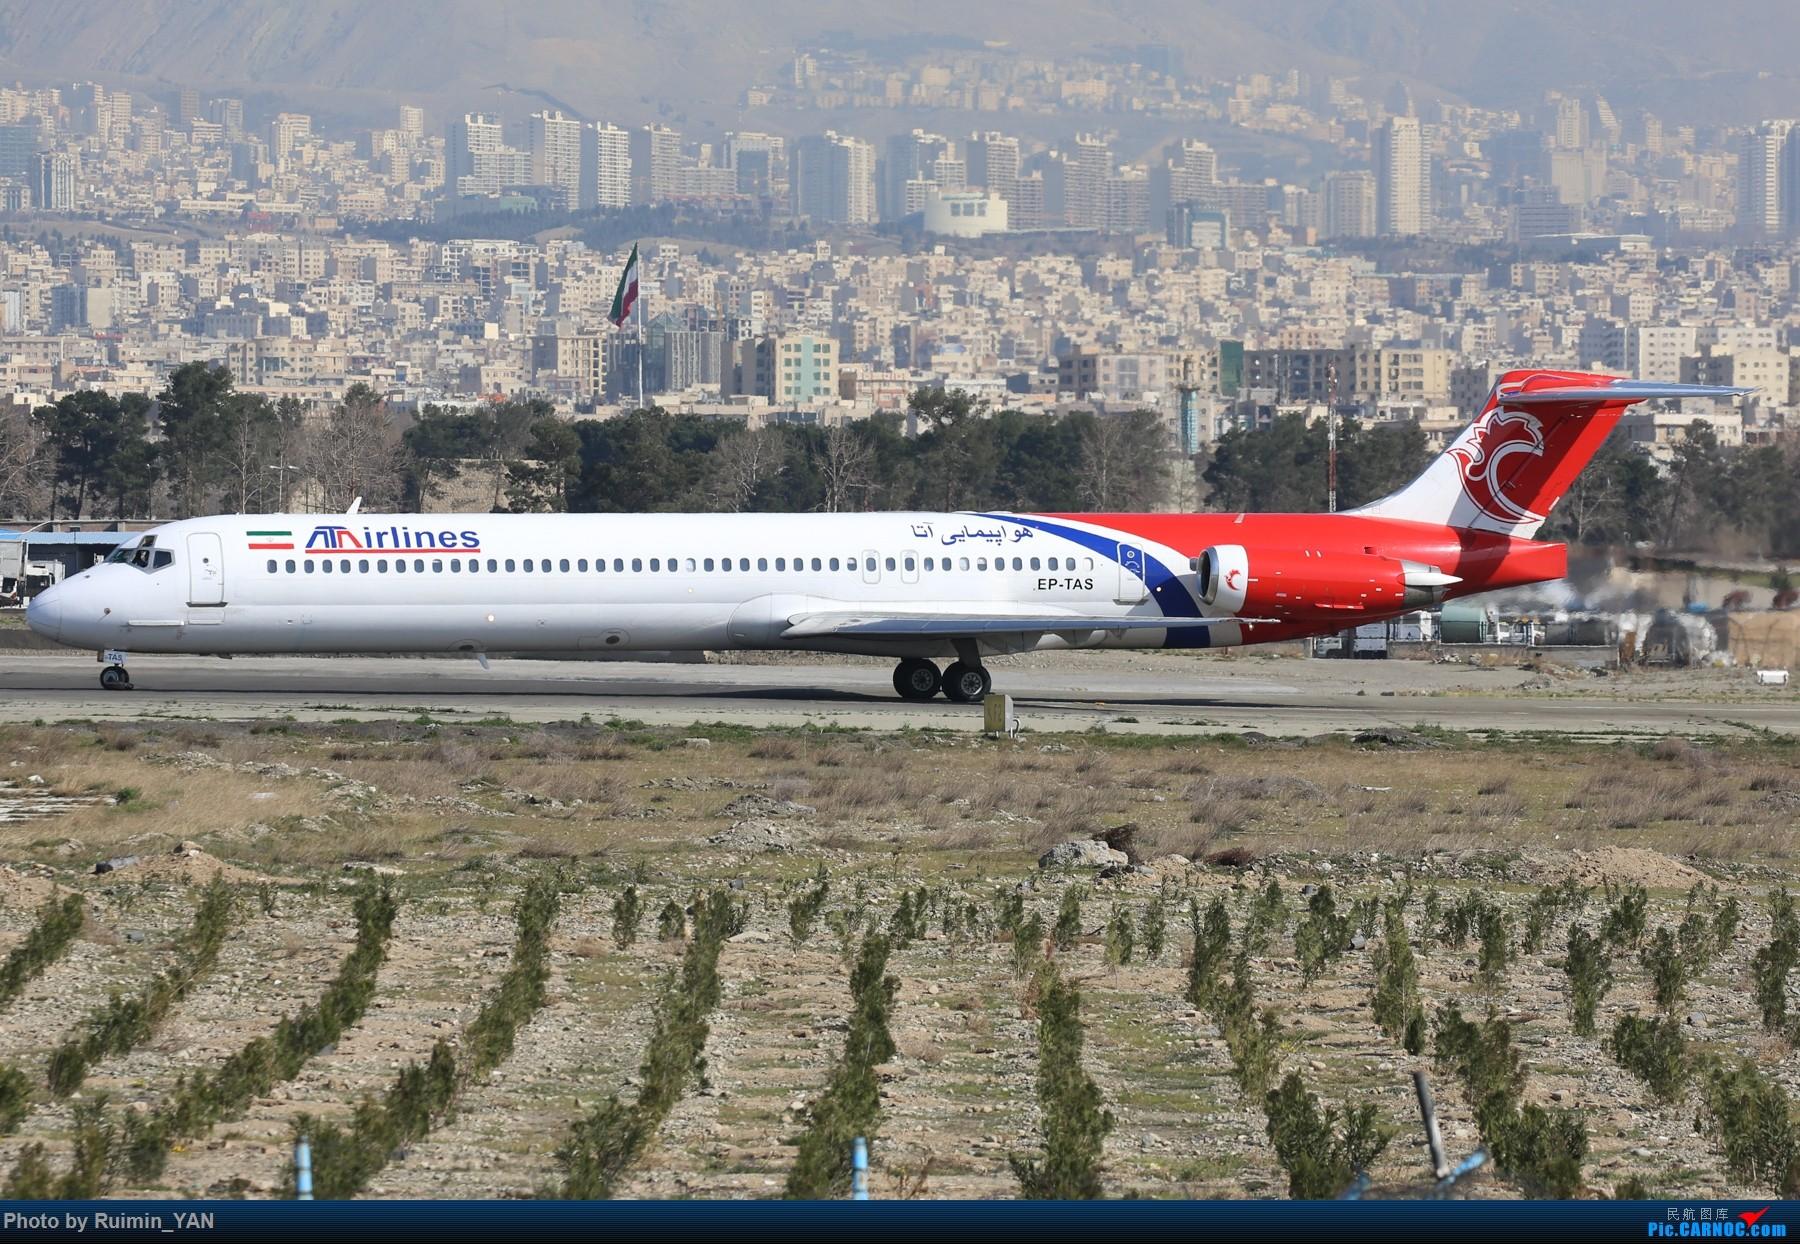 Re:[原创]【THR】(德黑兰梅赫拉巴德机场)伊朗ATA航空(ATA Airlines)--320 MD MD-80-83 EP-TAS 德黑兰梅赫拉巴德国际机场